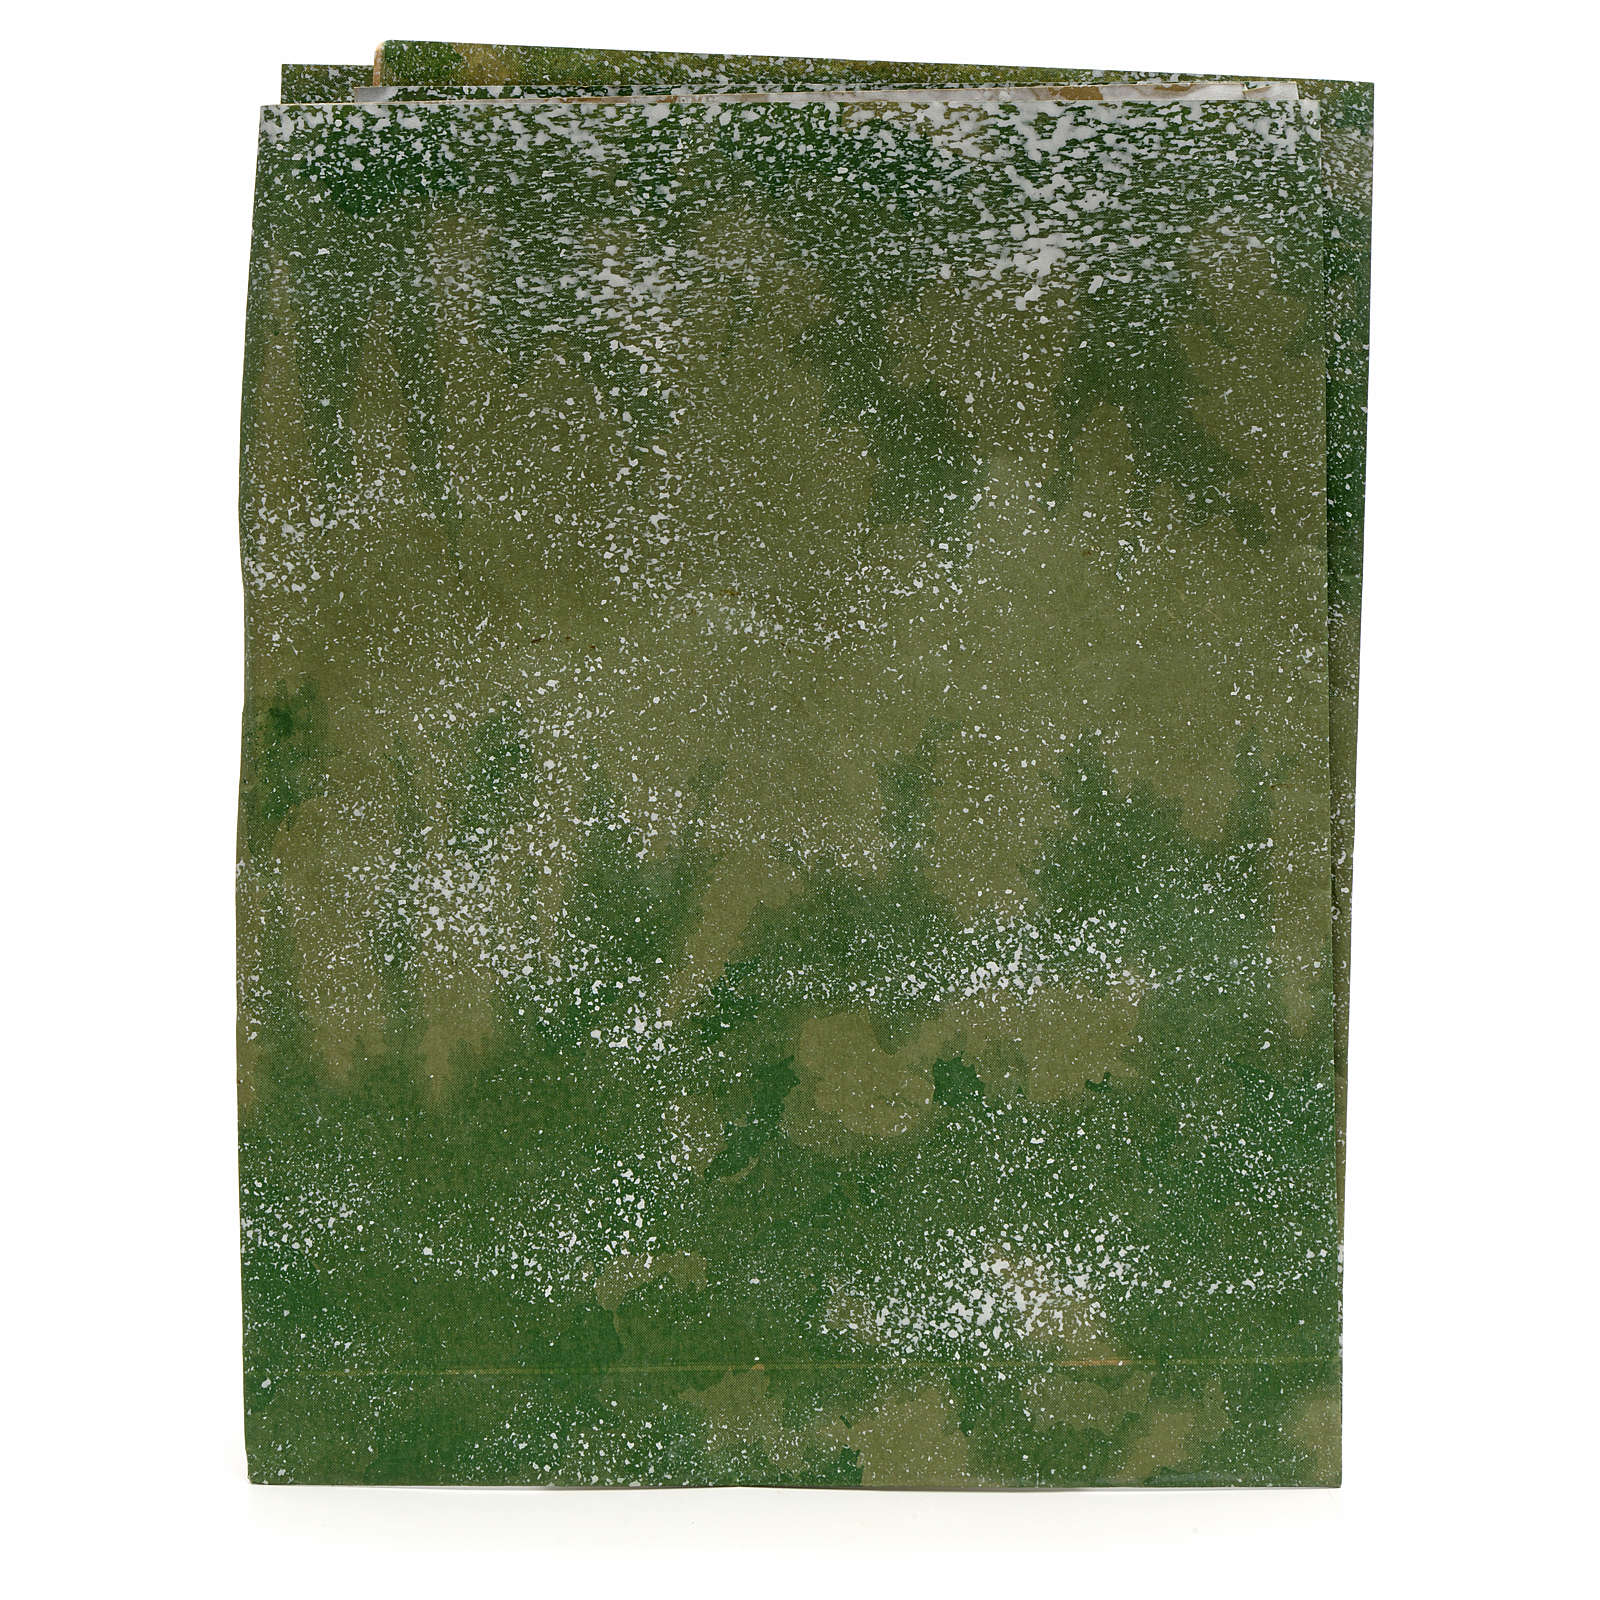 Carta prato innevato 70x50 cm 4